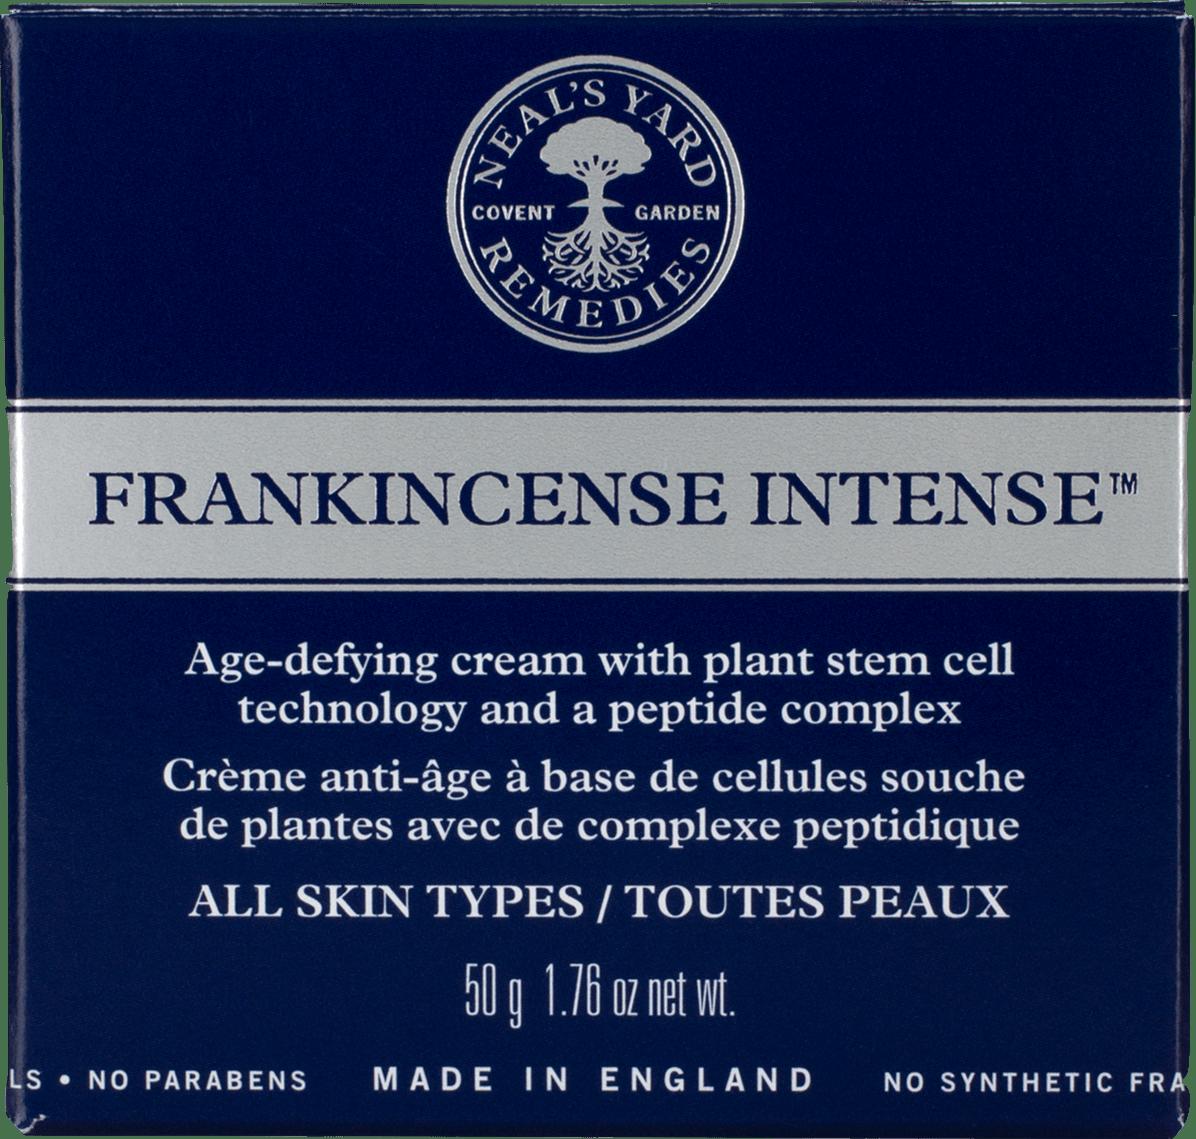 Multi-language Frankincense Intense carton